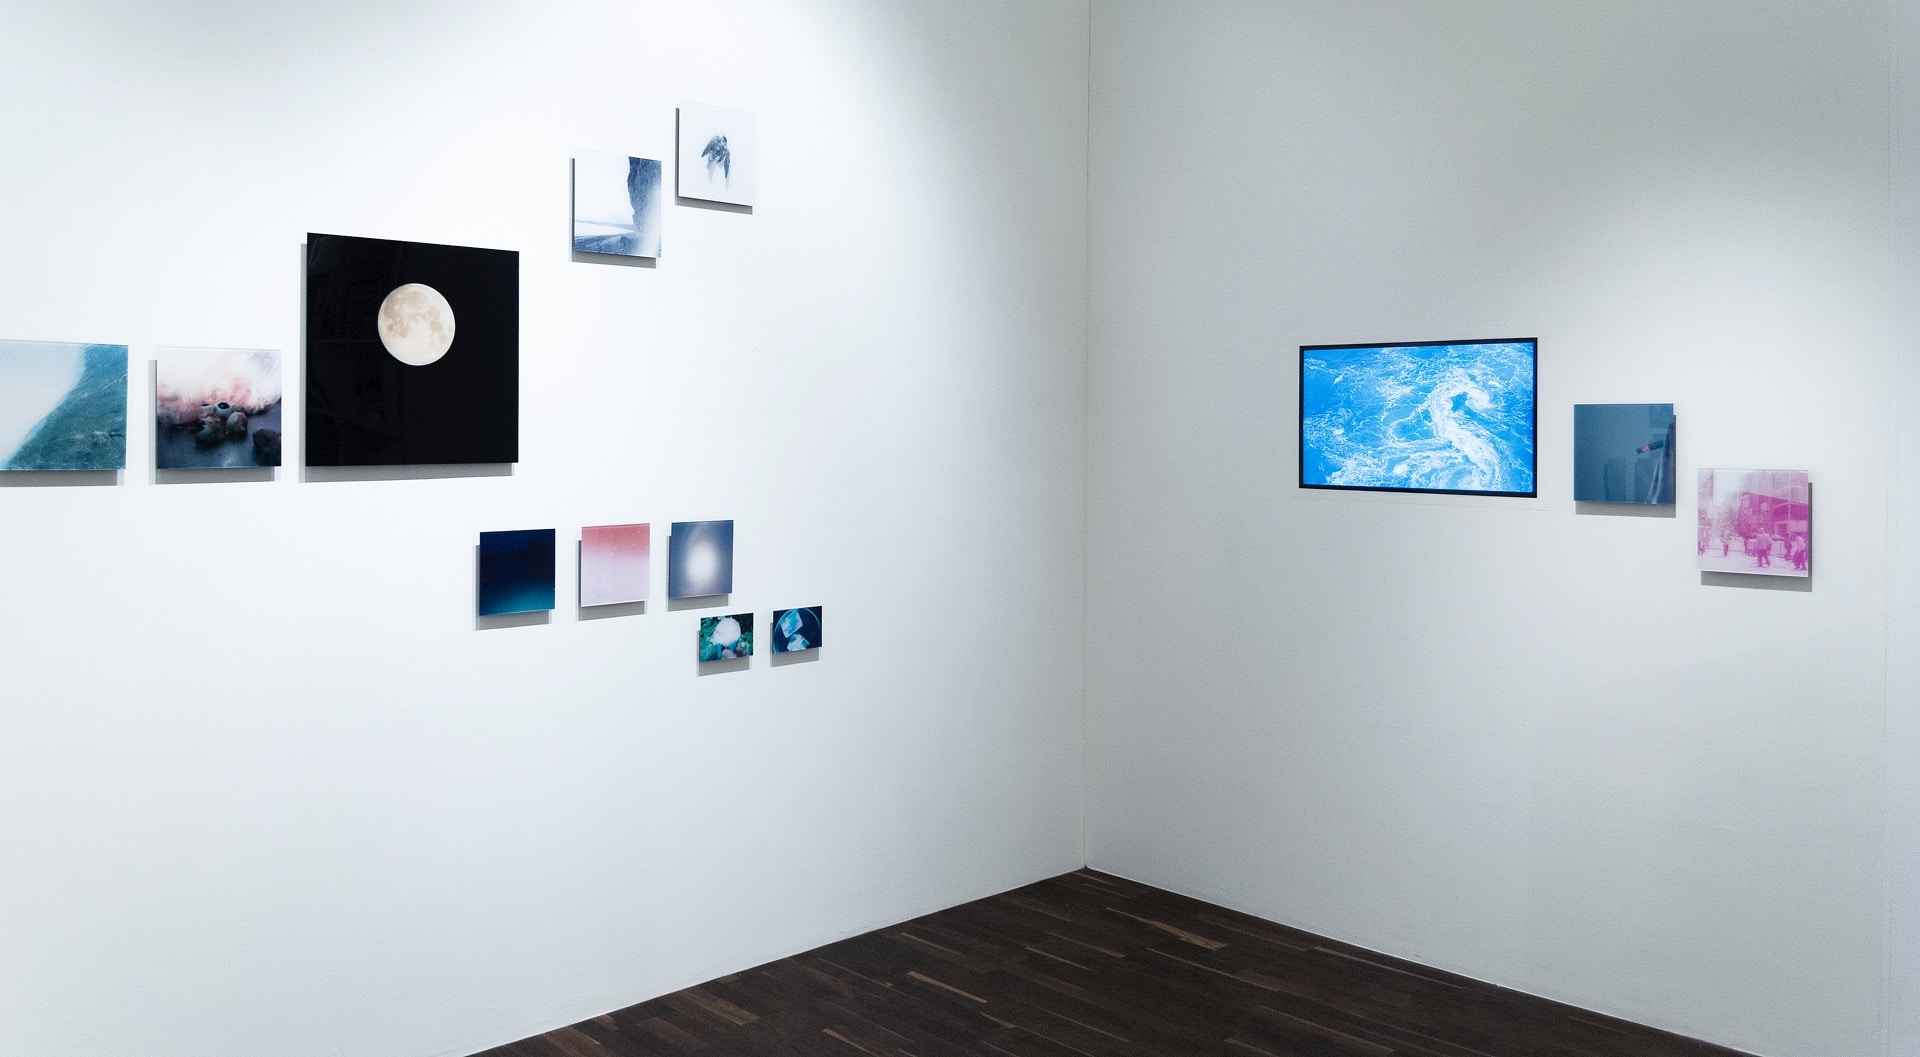 "Works by Japanese photographer Rinko Kawauchi in the 2013 exhibition ""Illuminance"" at Christophe Guye Galerie in Zurich"